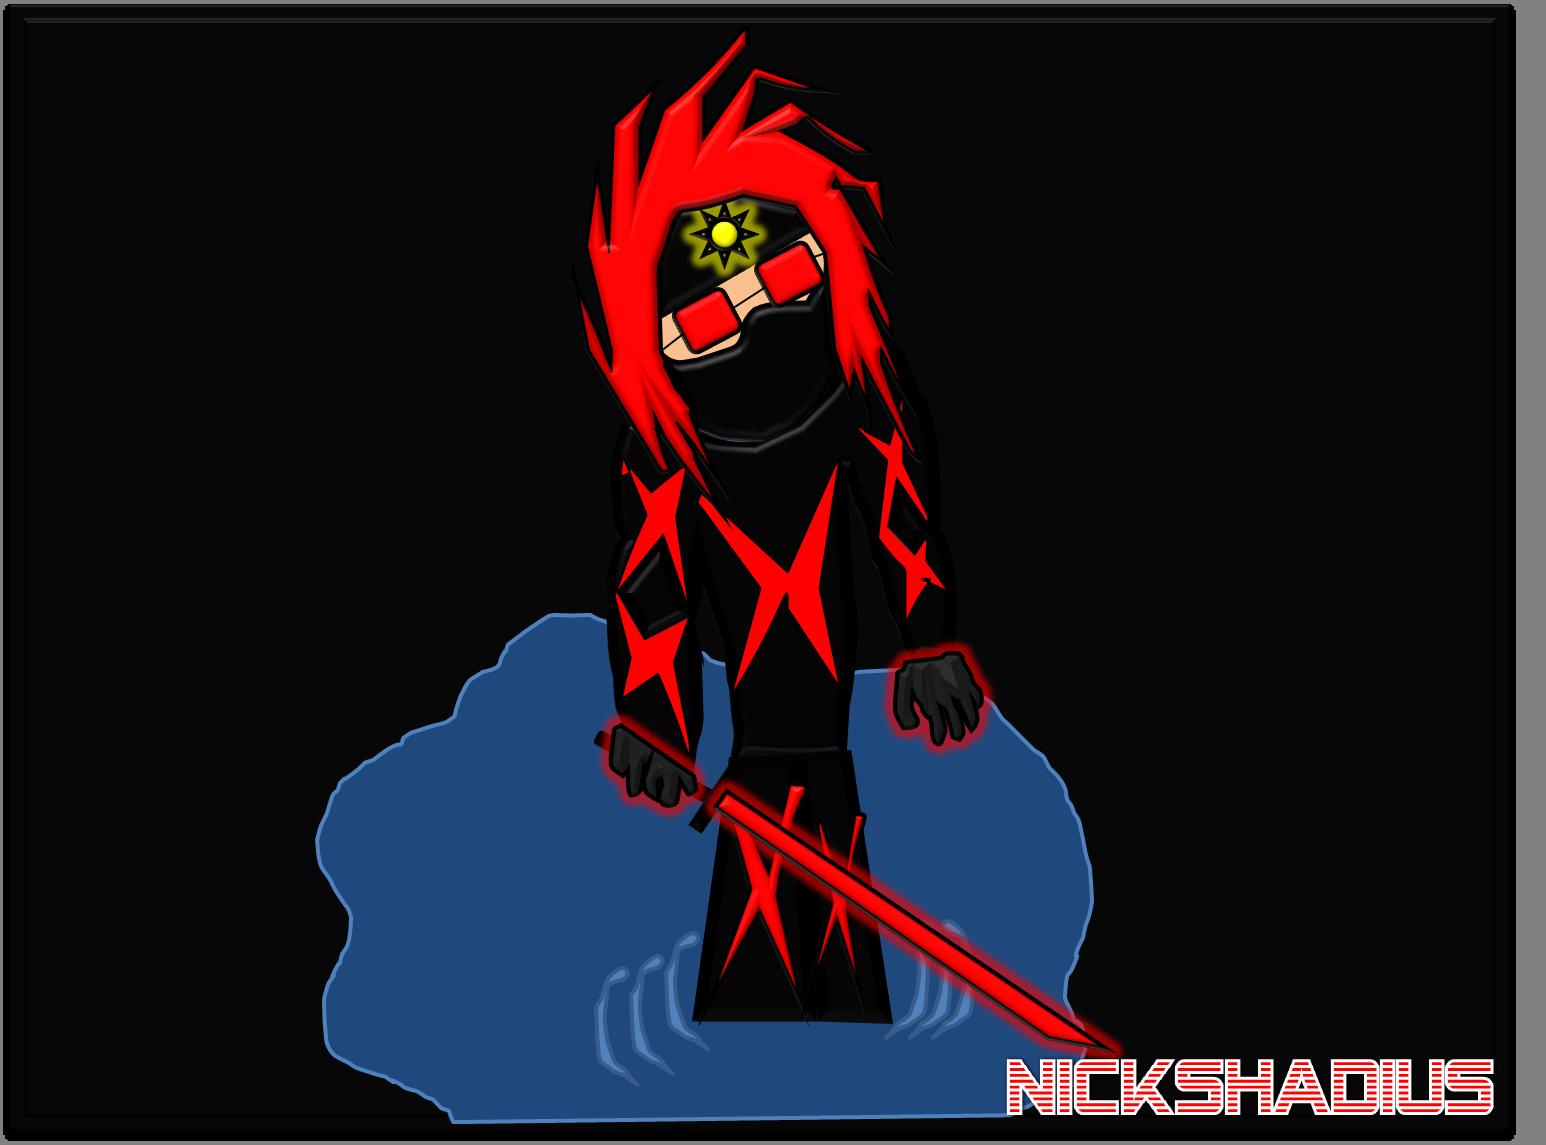 NickShadius Ninja